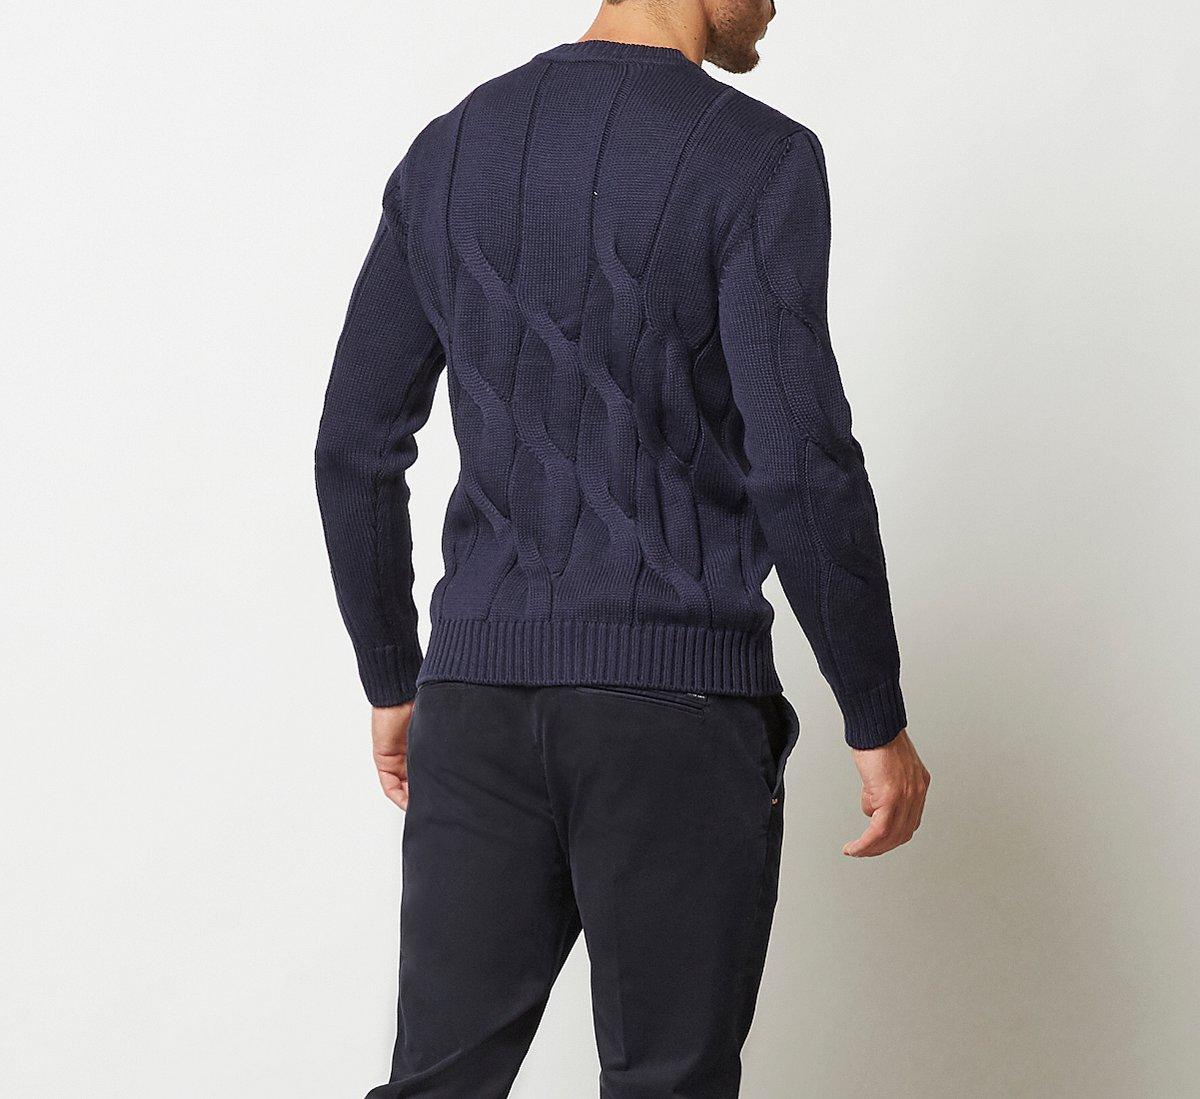 Maglioncino a fantasia in calda lana